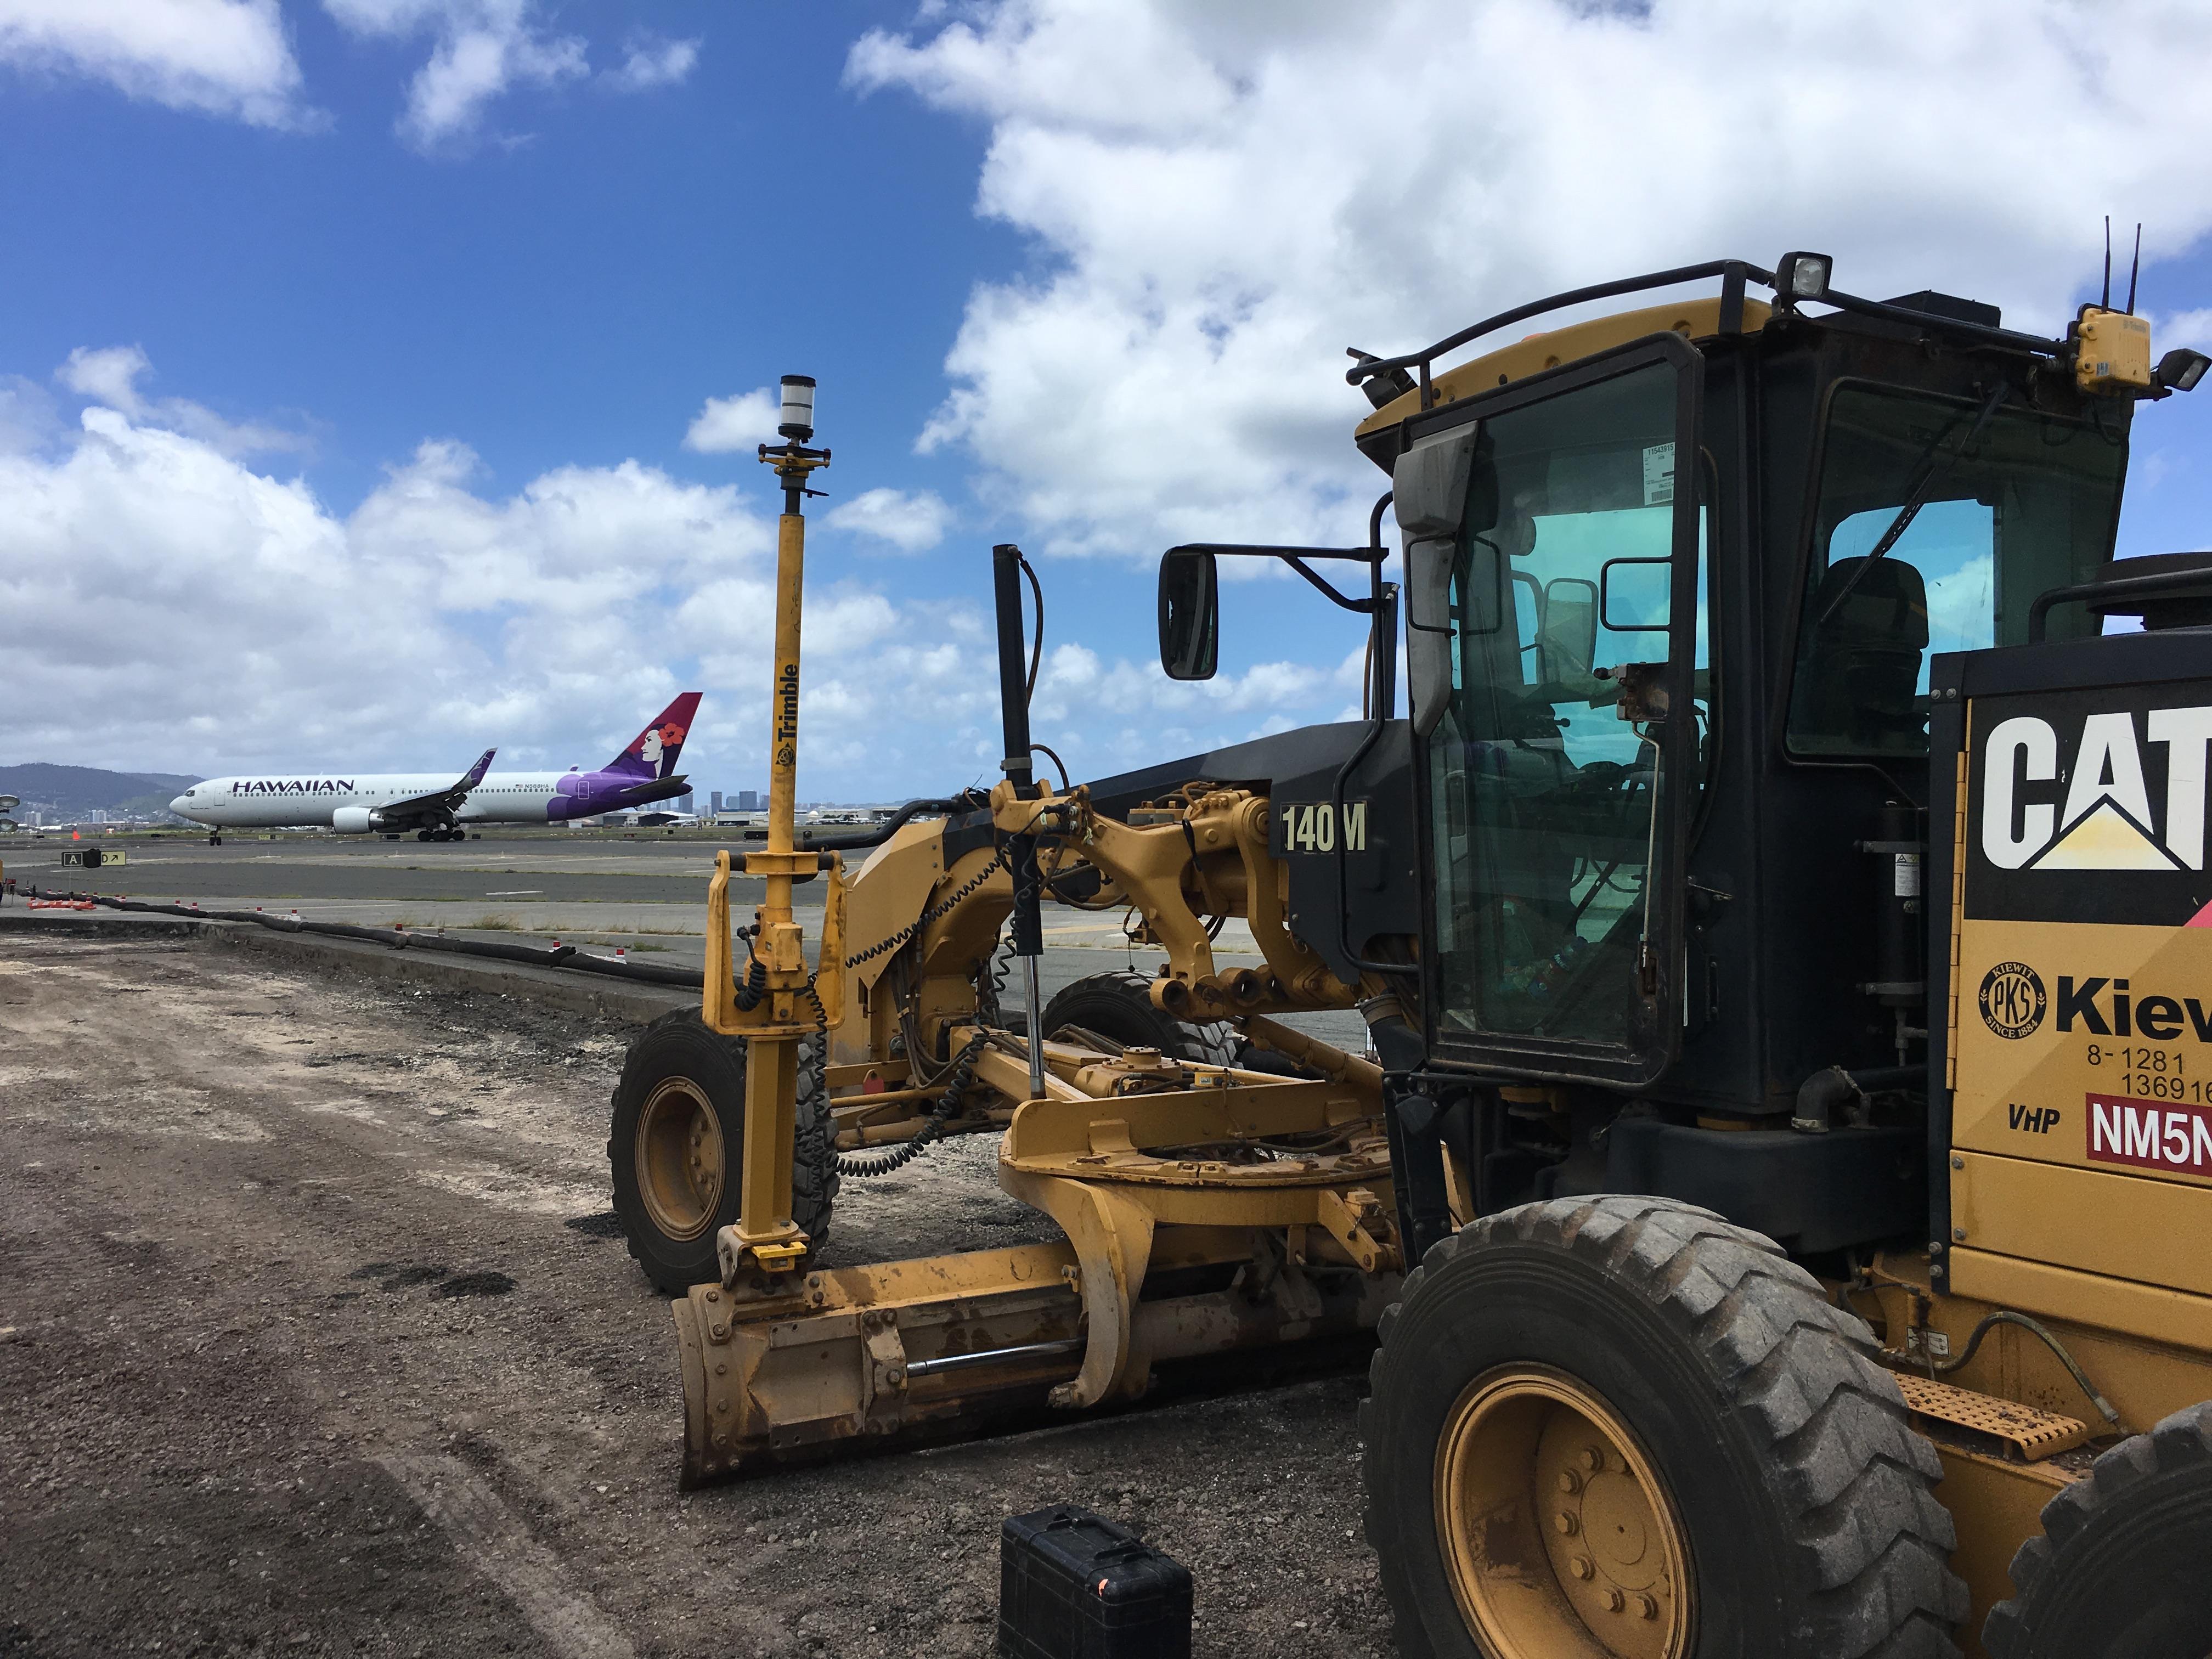 At Honolulu International Airport